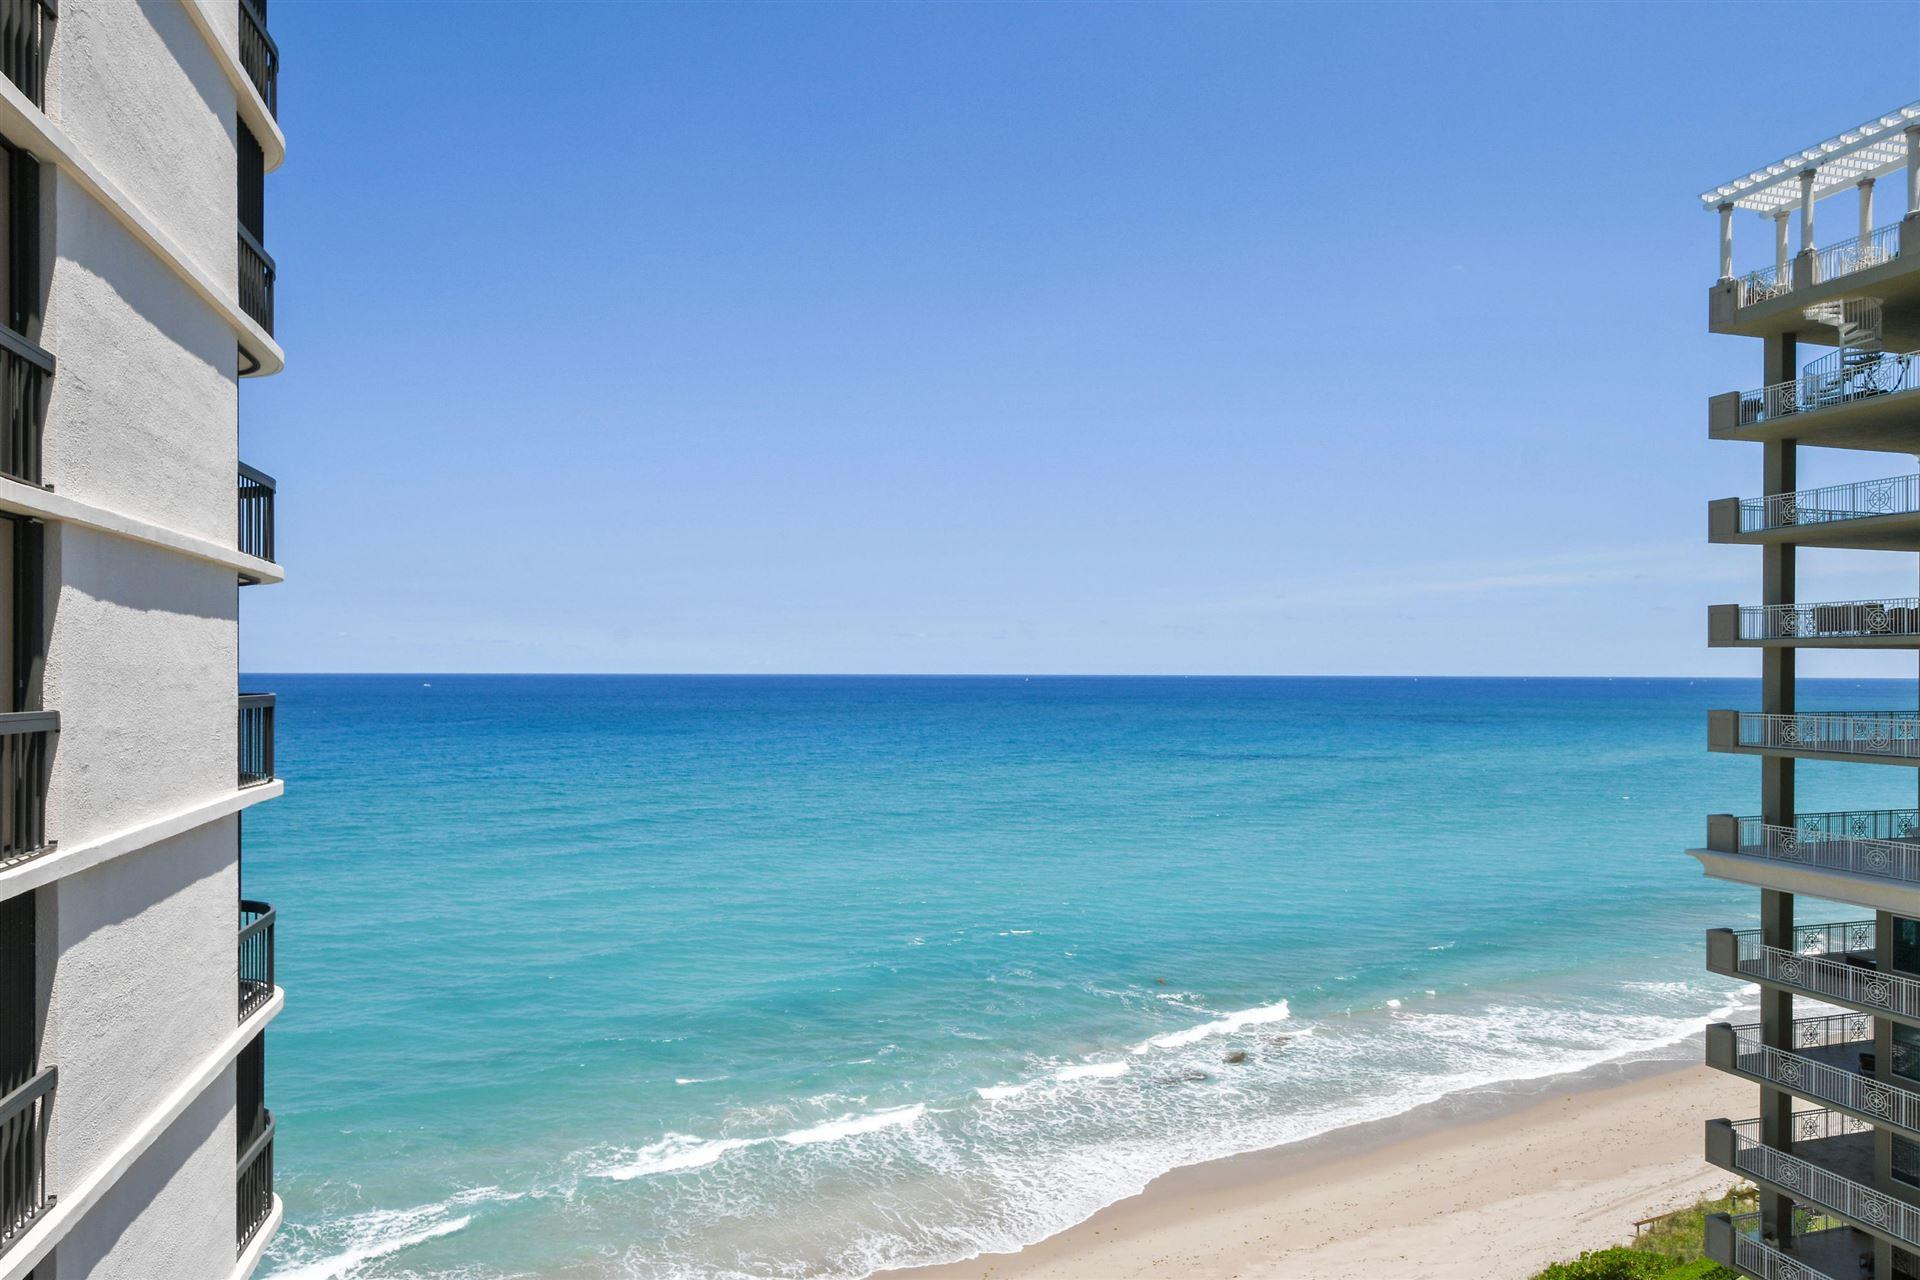 Photo of 5380 N Ocean Drive #12c, Riviera Beach, FL 33404 (MLS # RX-10621669)